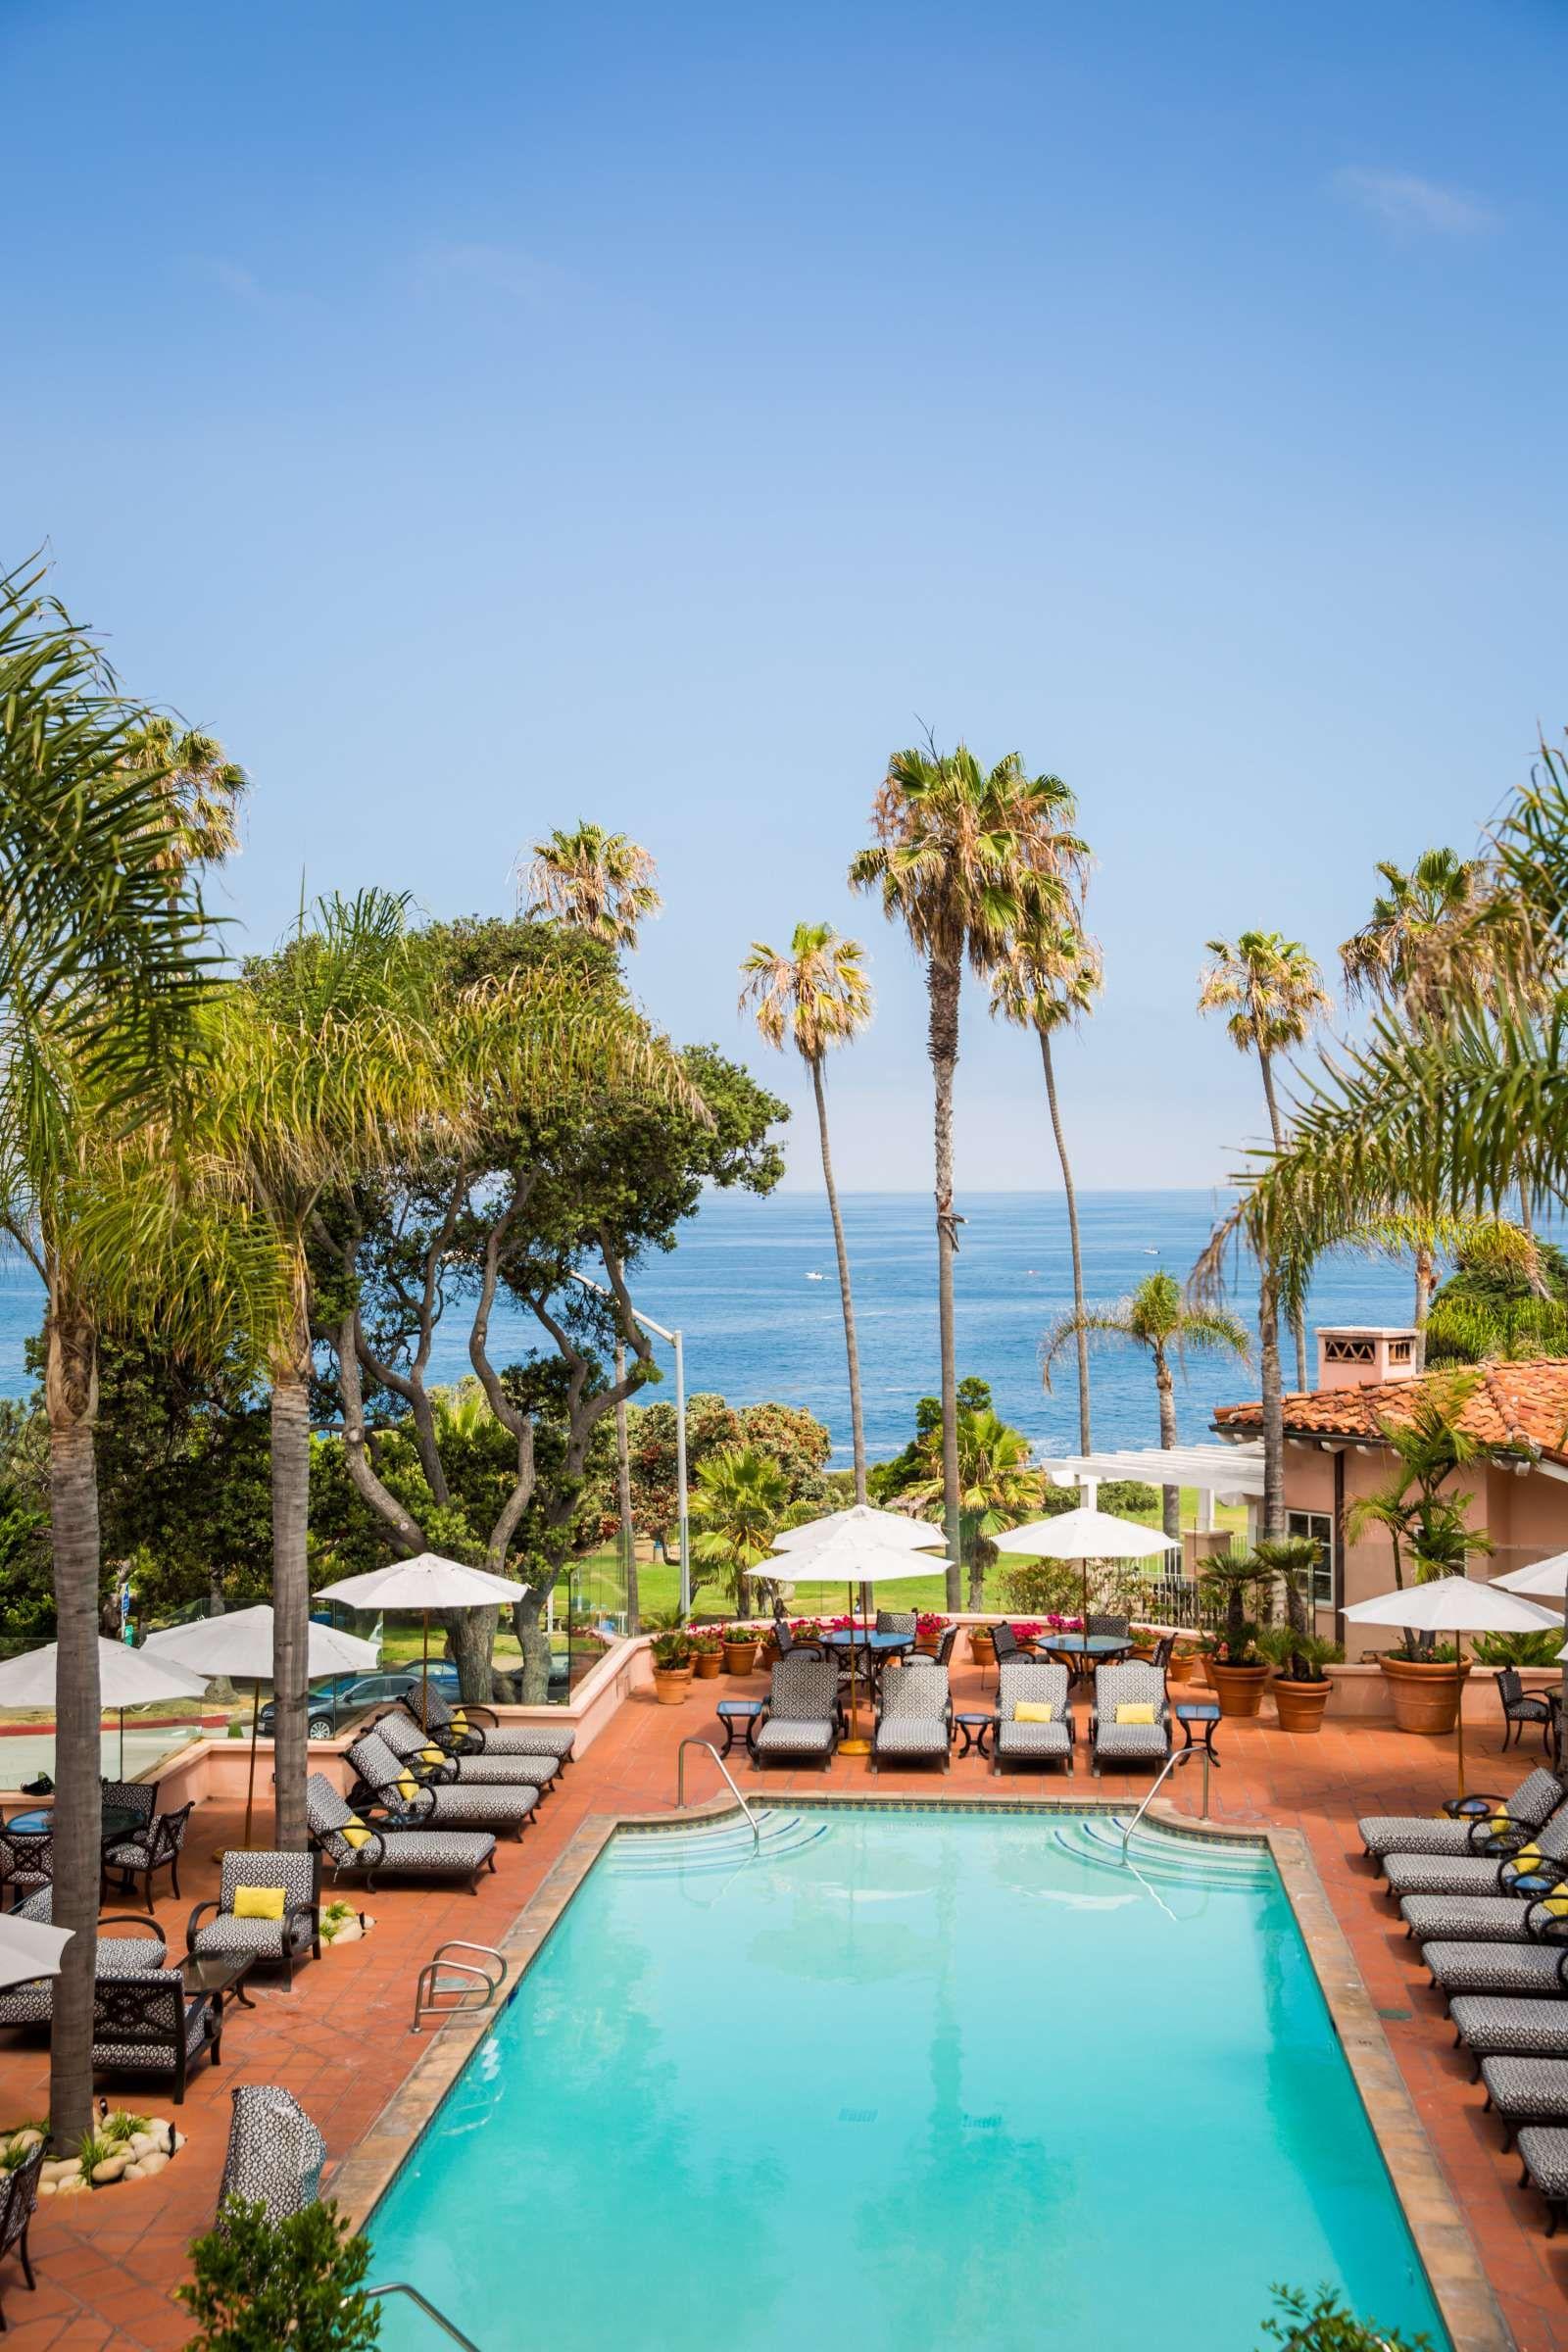 Ocean View Pool La Valencia Hotel La Jolla Ca True Photography With Images La Valencia Hotel La Jolla Hotels Hotel La